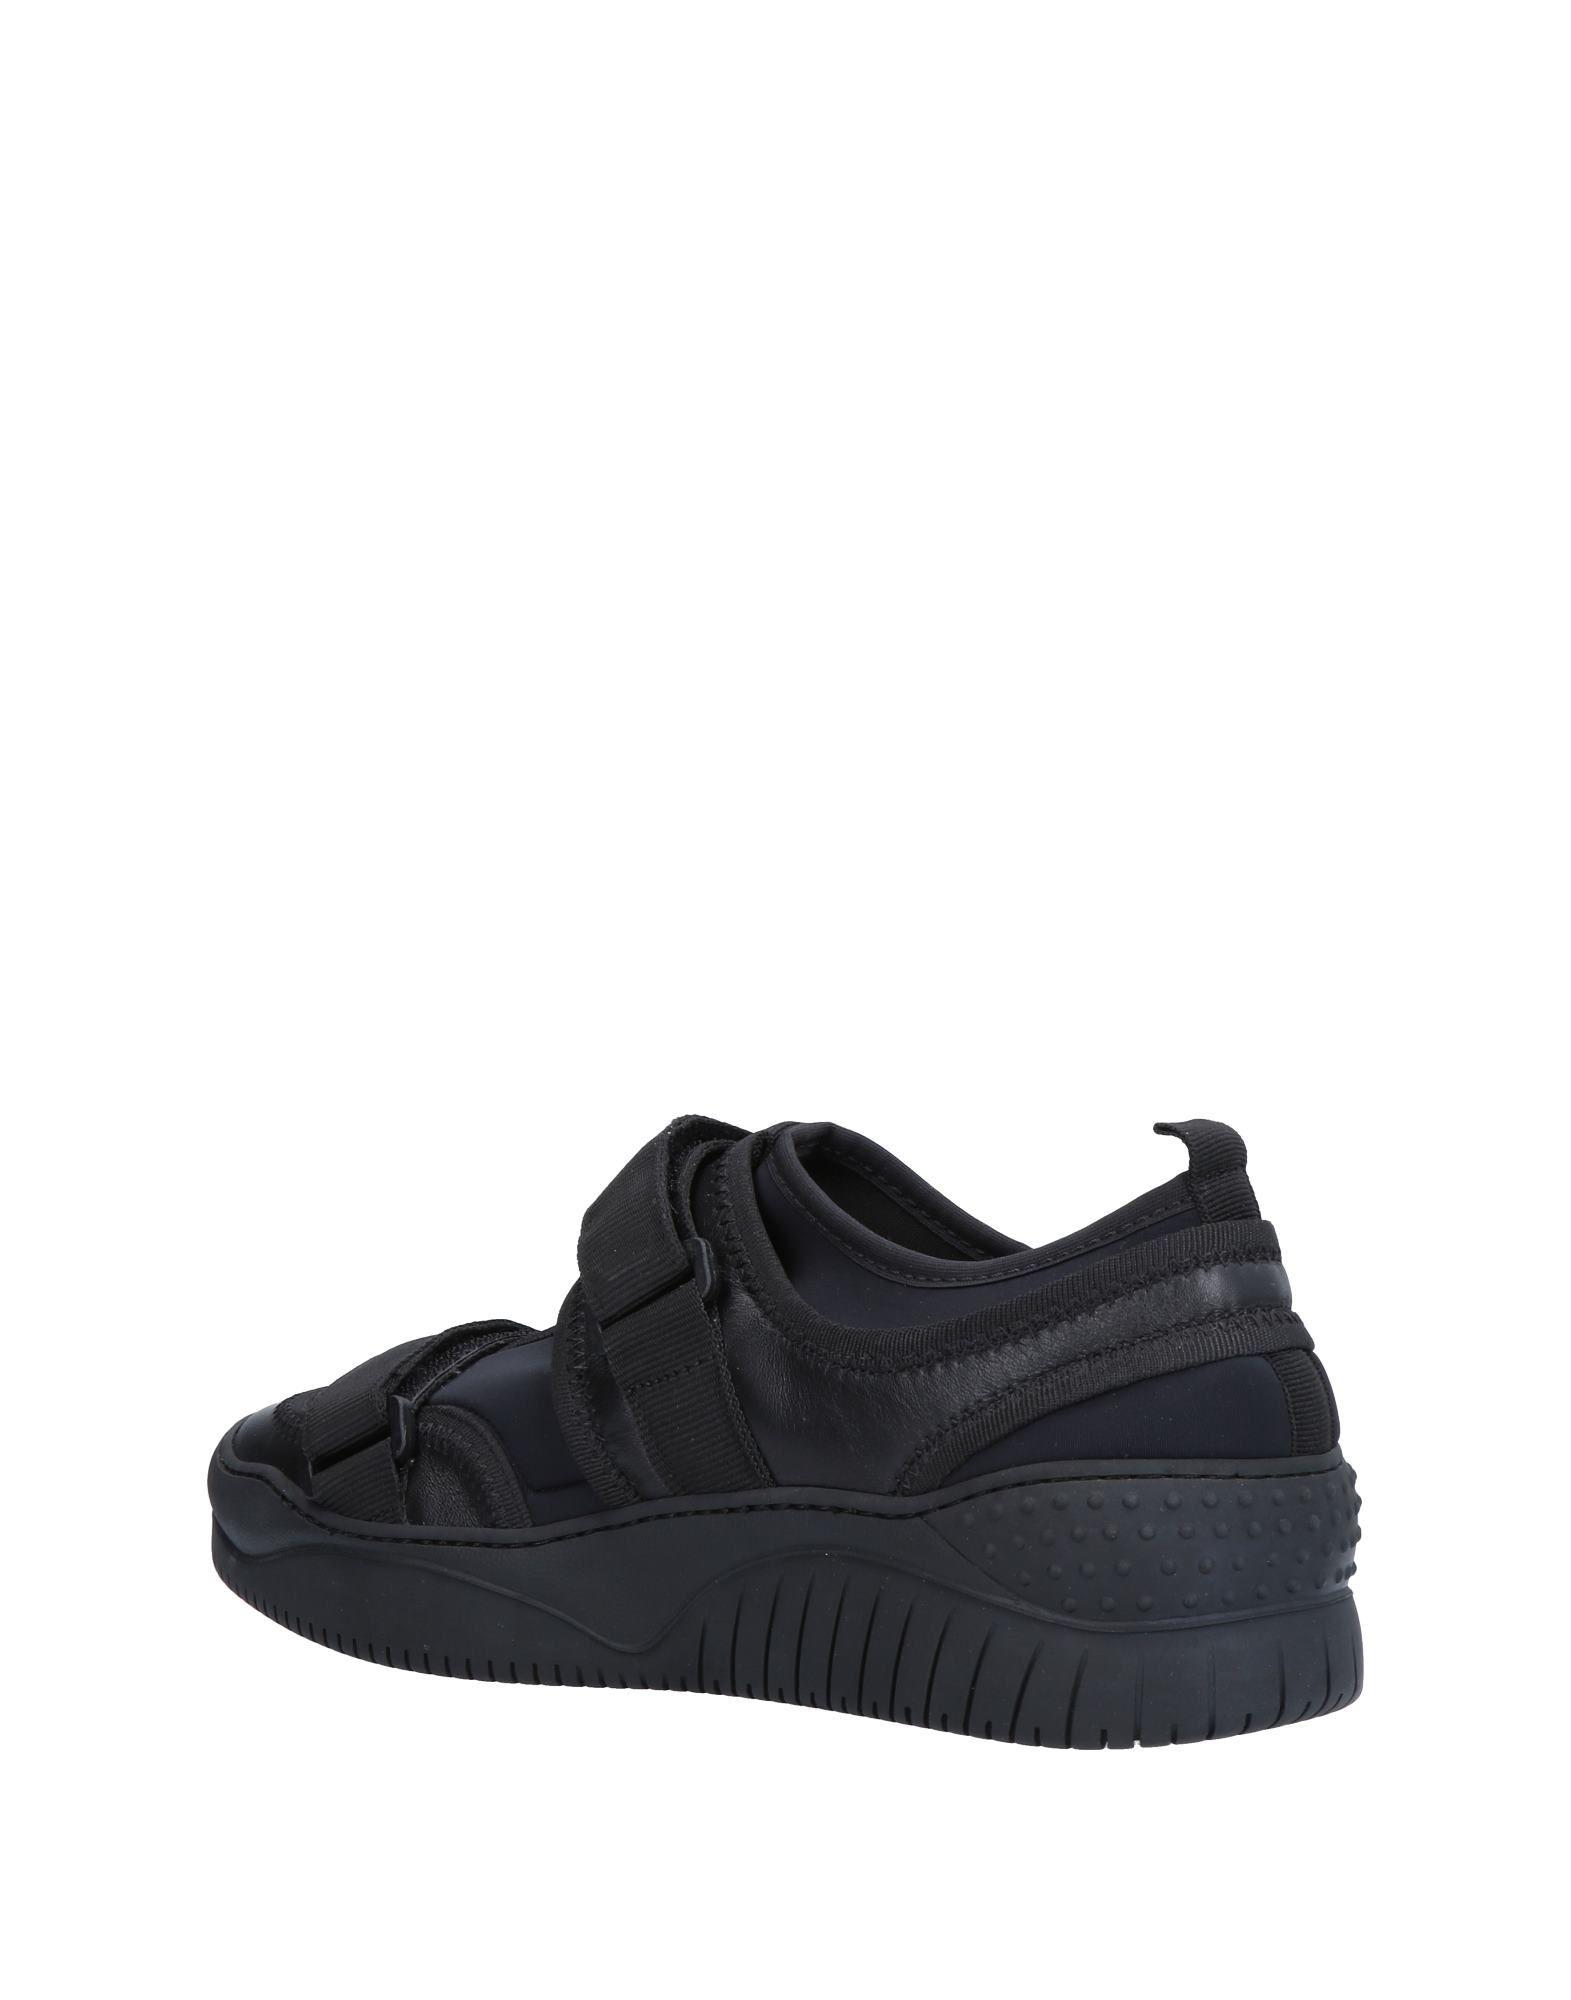 N° 21 Sneakers Herren  11514501GR Gute Qualität beliebte Schuhe